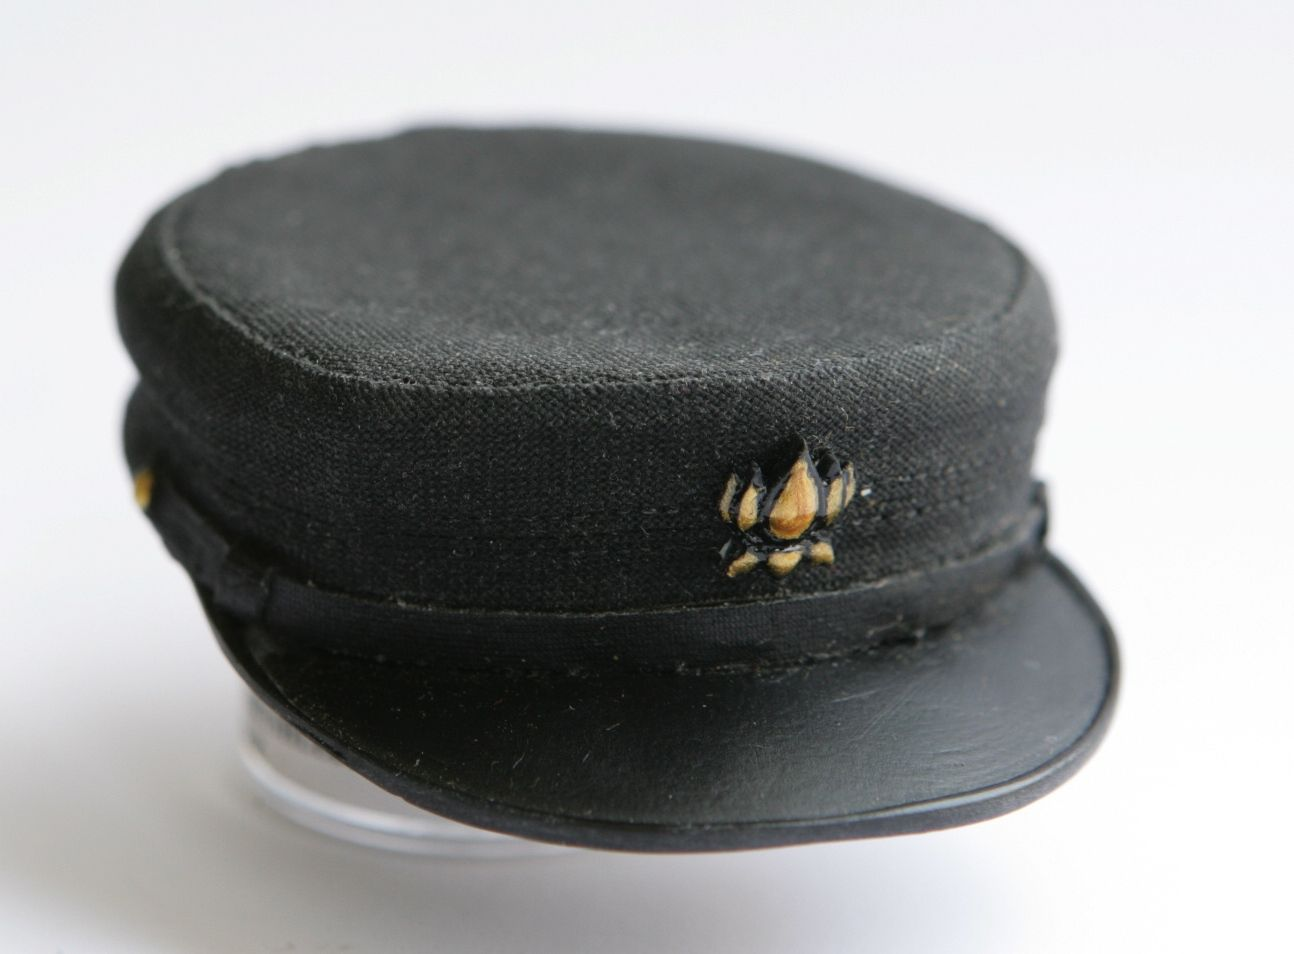 Thebreadsmasher Coraline S Military Hat Full Size Prop Coraline Coraline Jones Coraline Aesthetic